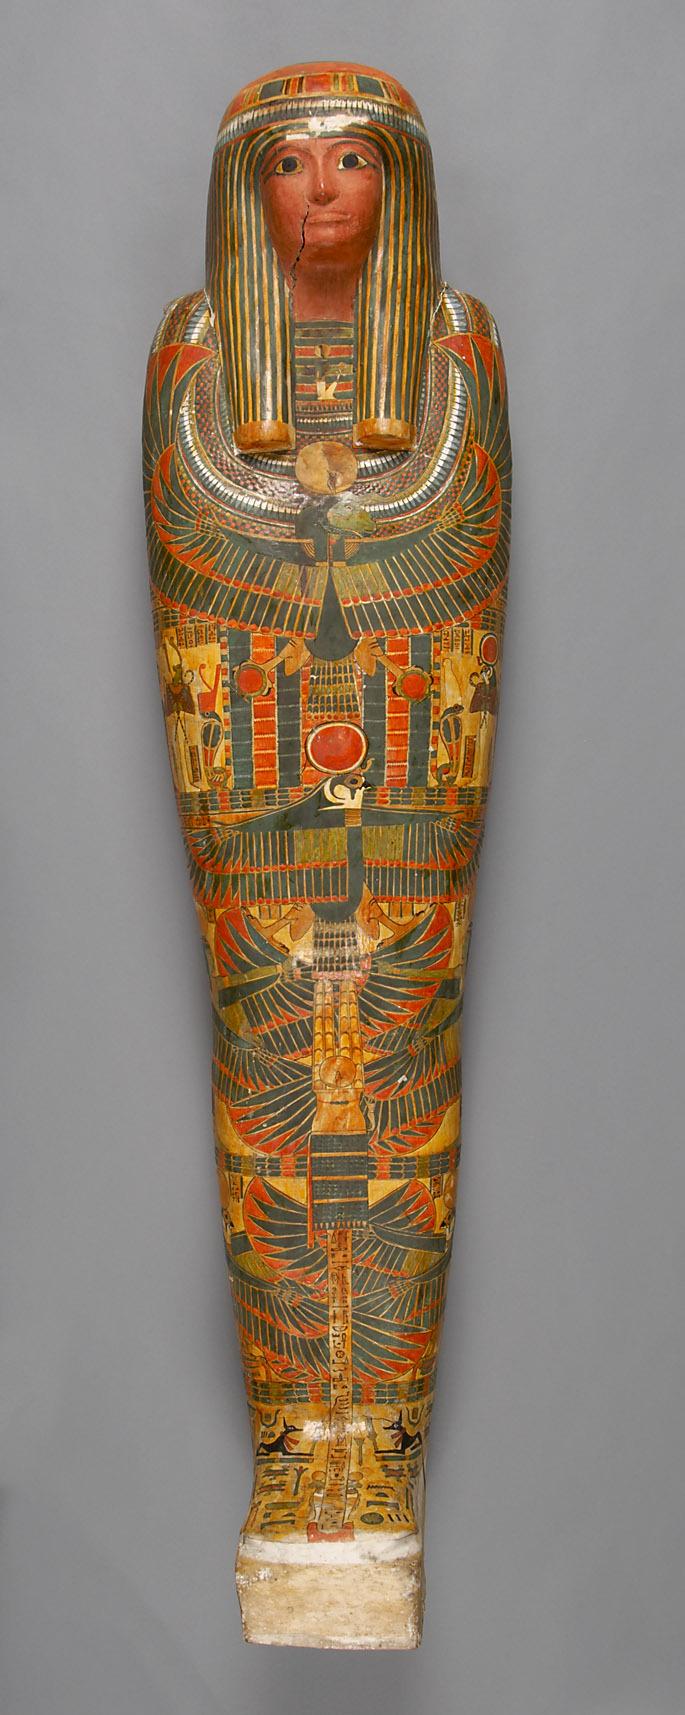 Mumie des Pa-di-set in Kartonagehülle